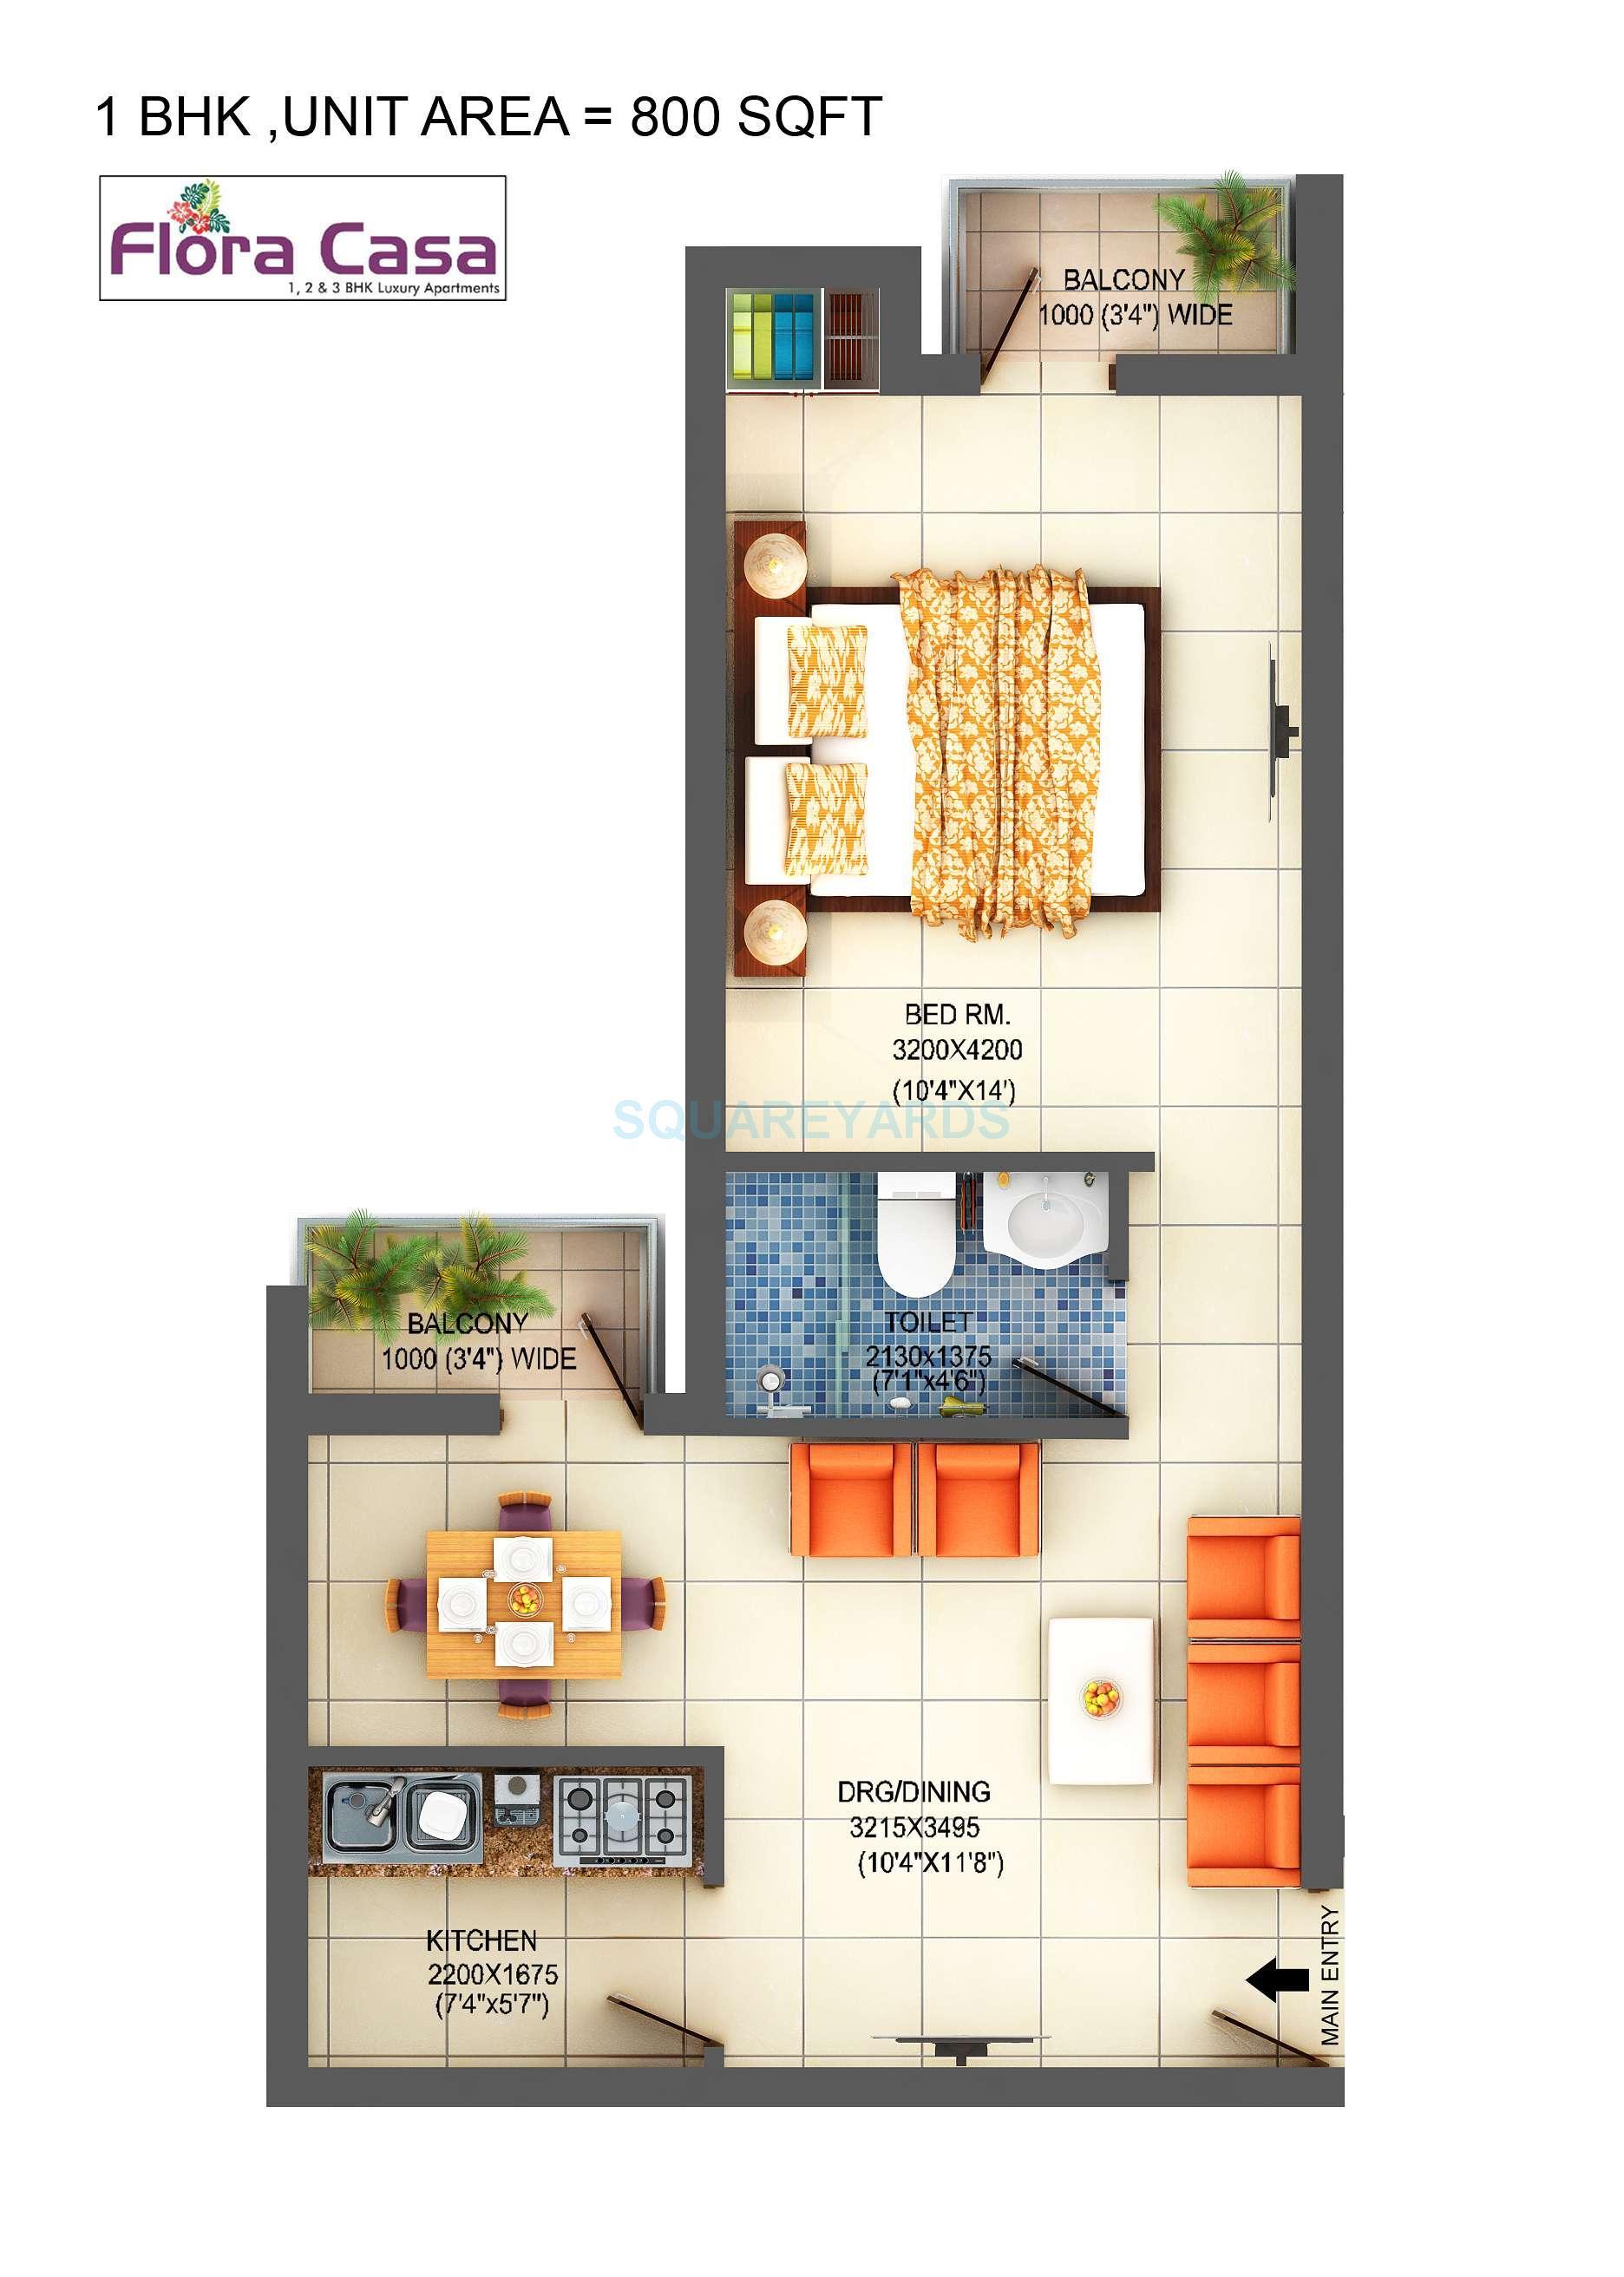 1 BHK 800 Sq. Ft. Apartment Floor Plan